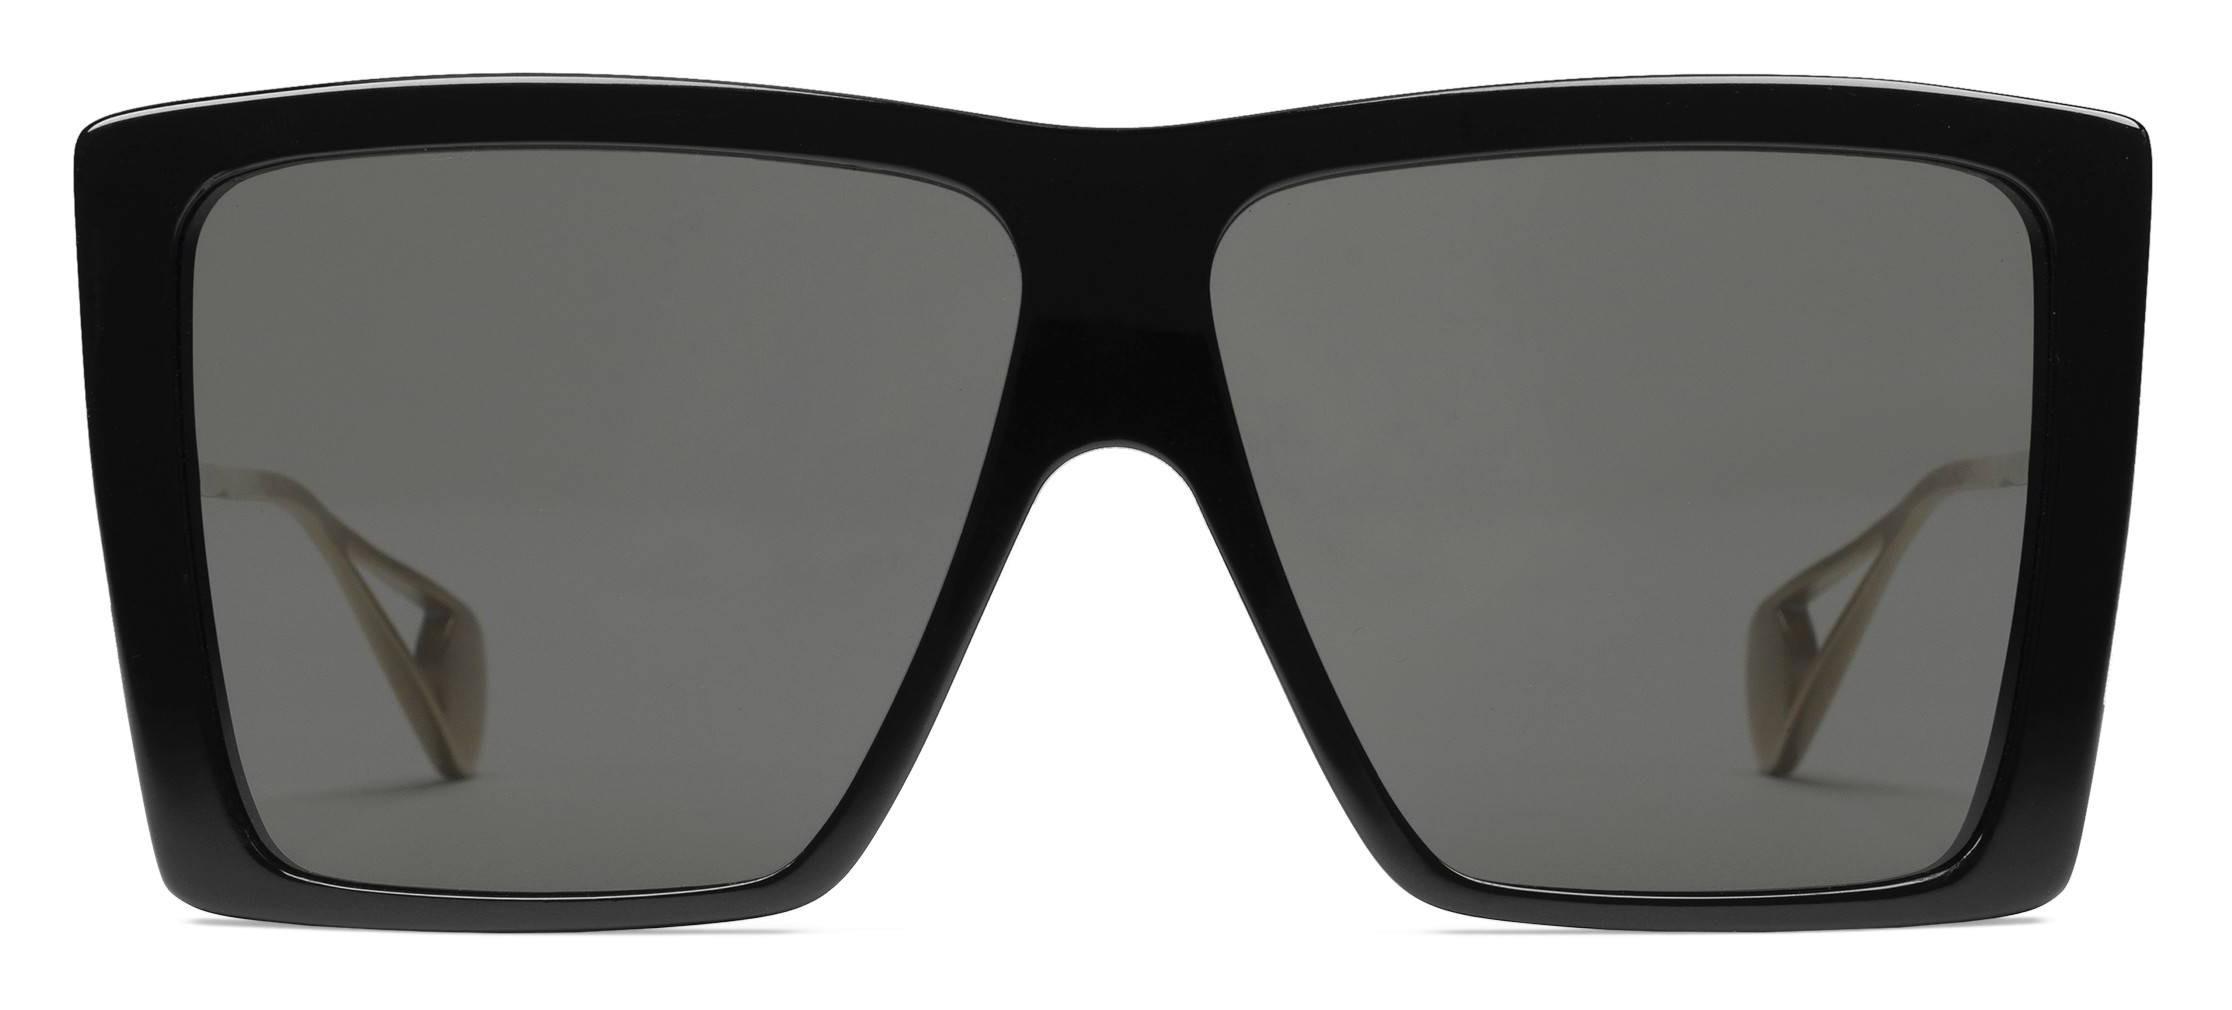 5d69198ce Gucci - Square Frame Sunglasses - Black - Gucci Eyewear - Avvenice